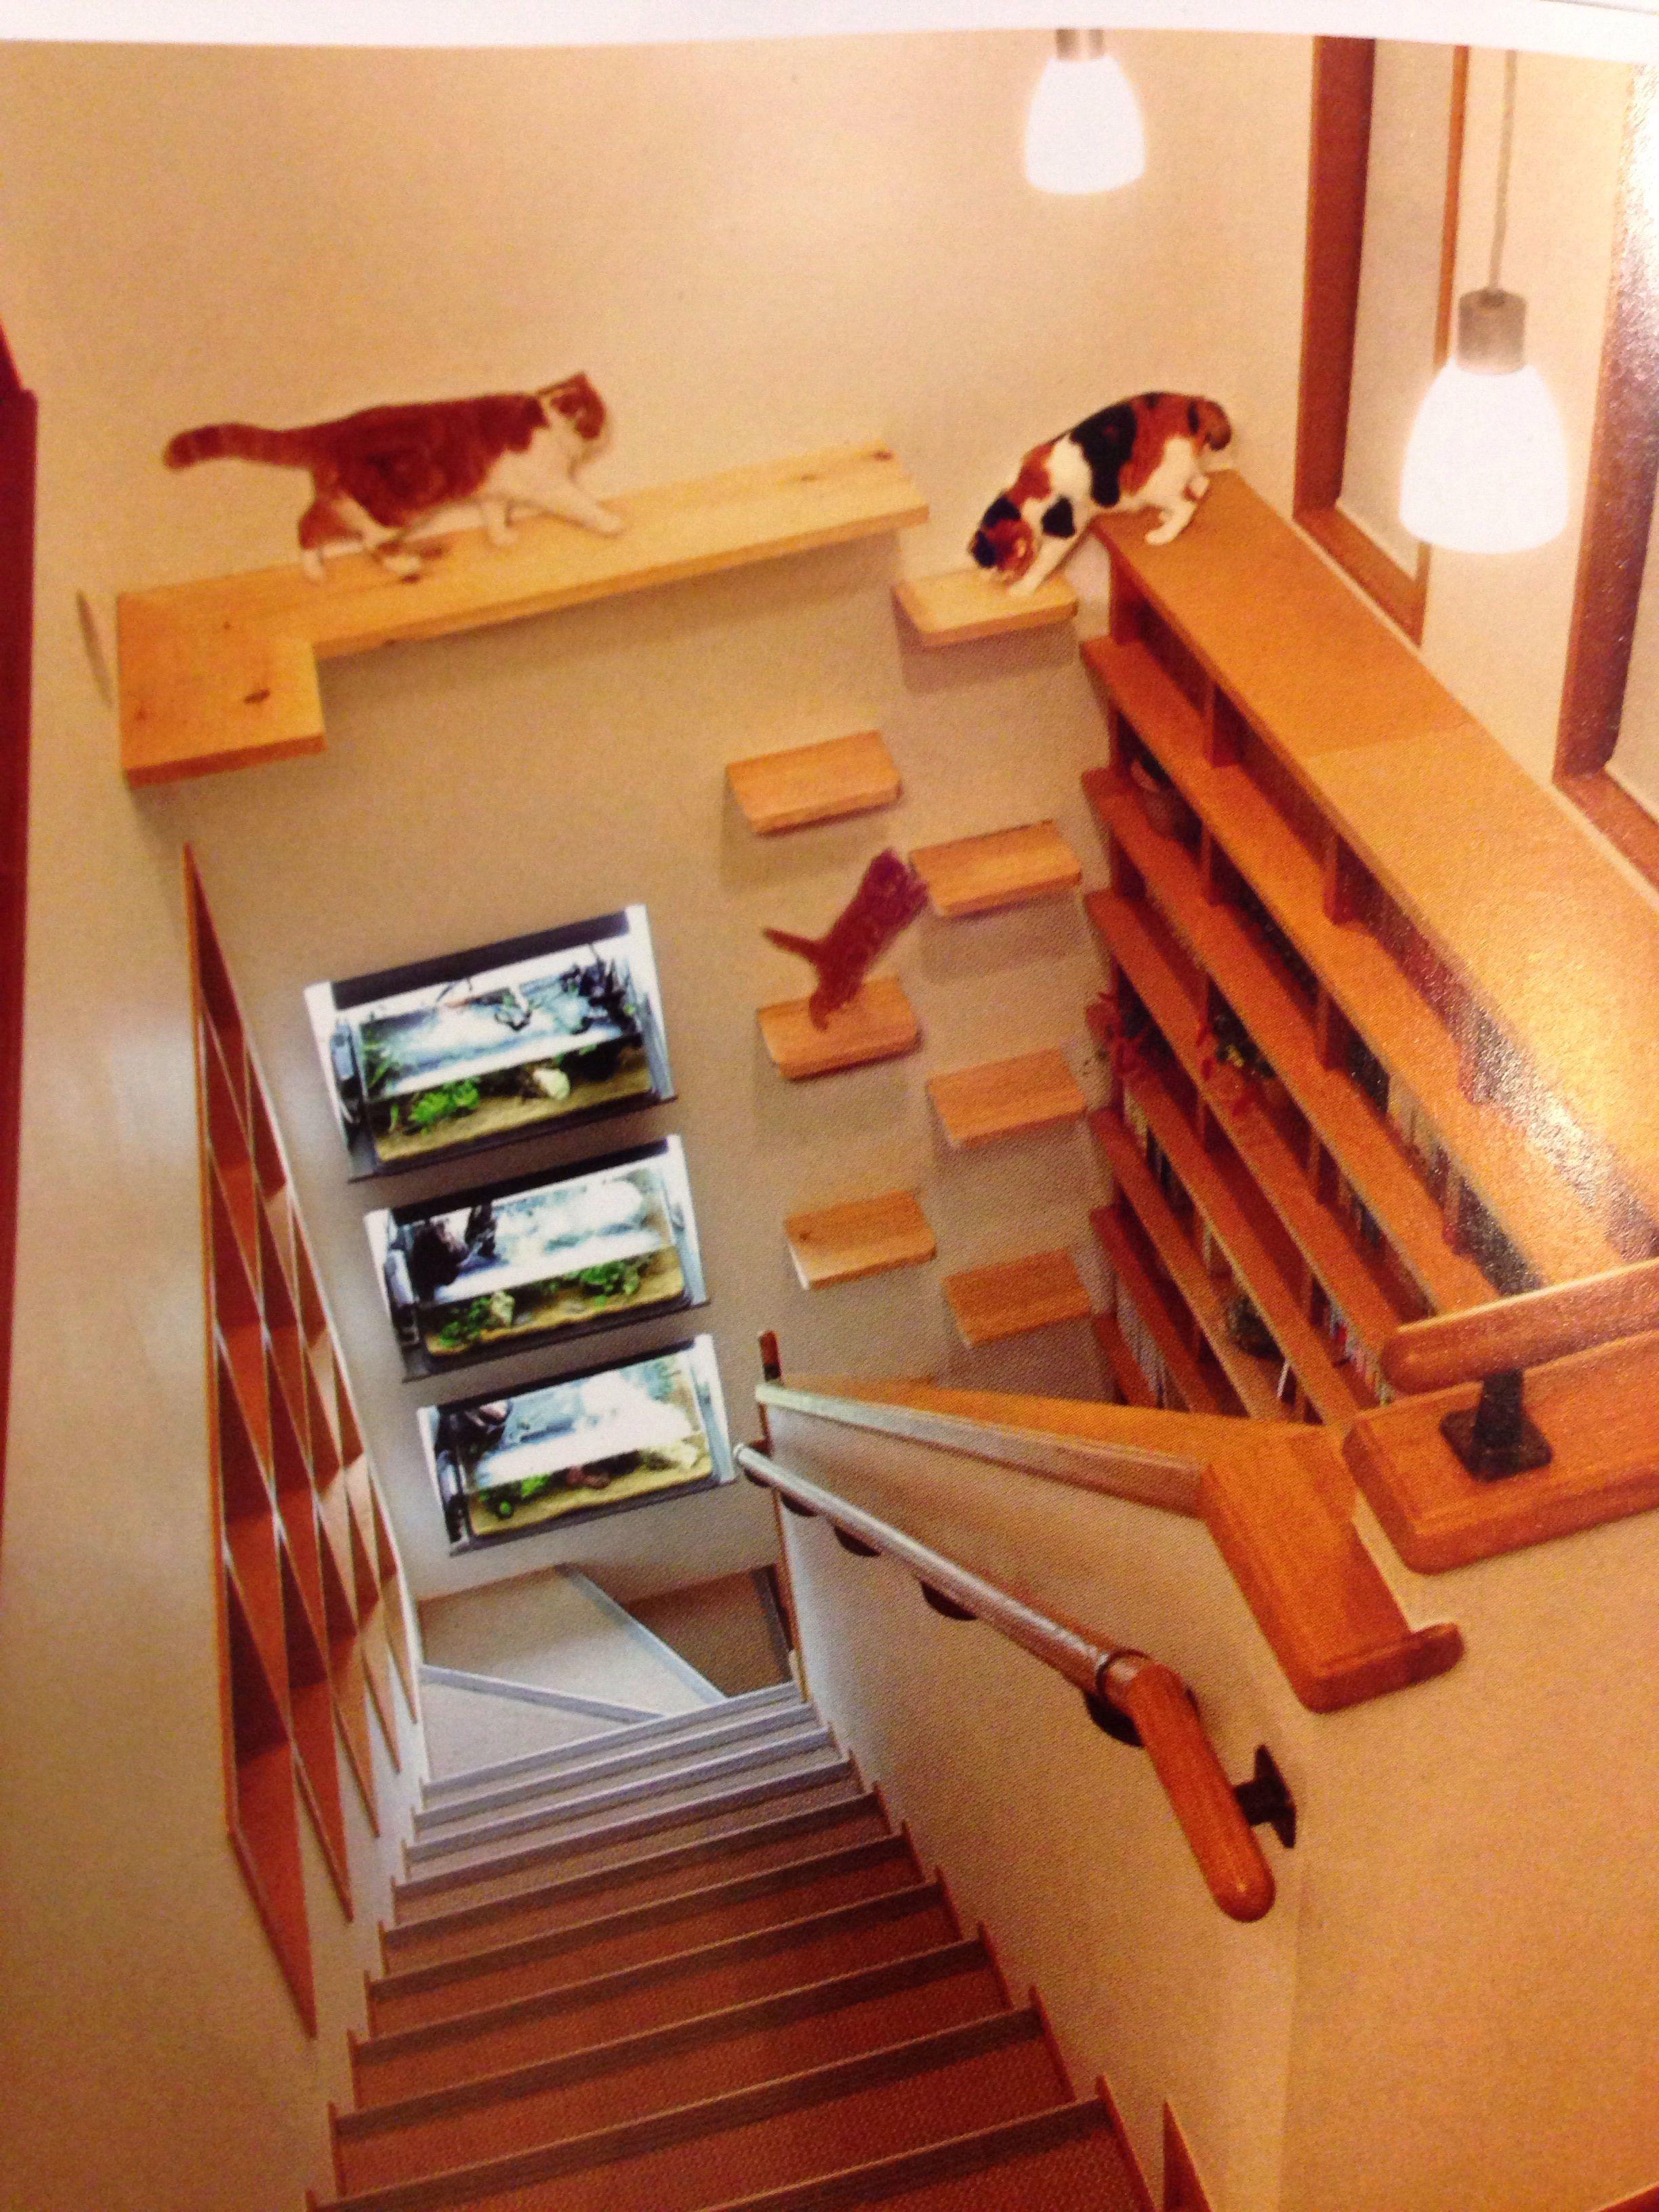 katzen kletterwand bauen katzen kletterwand pinterest. Black Bedroom Furniture Sets. Home Design Ideas